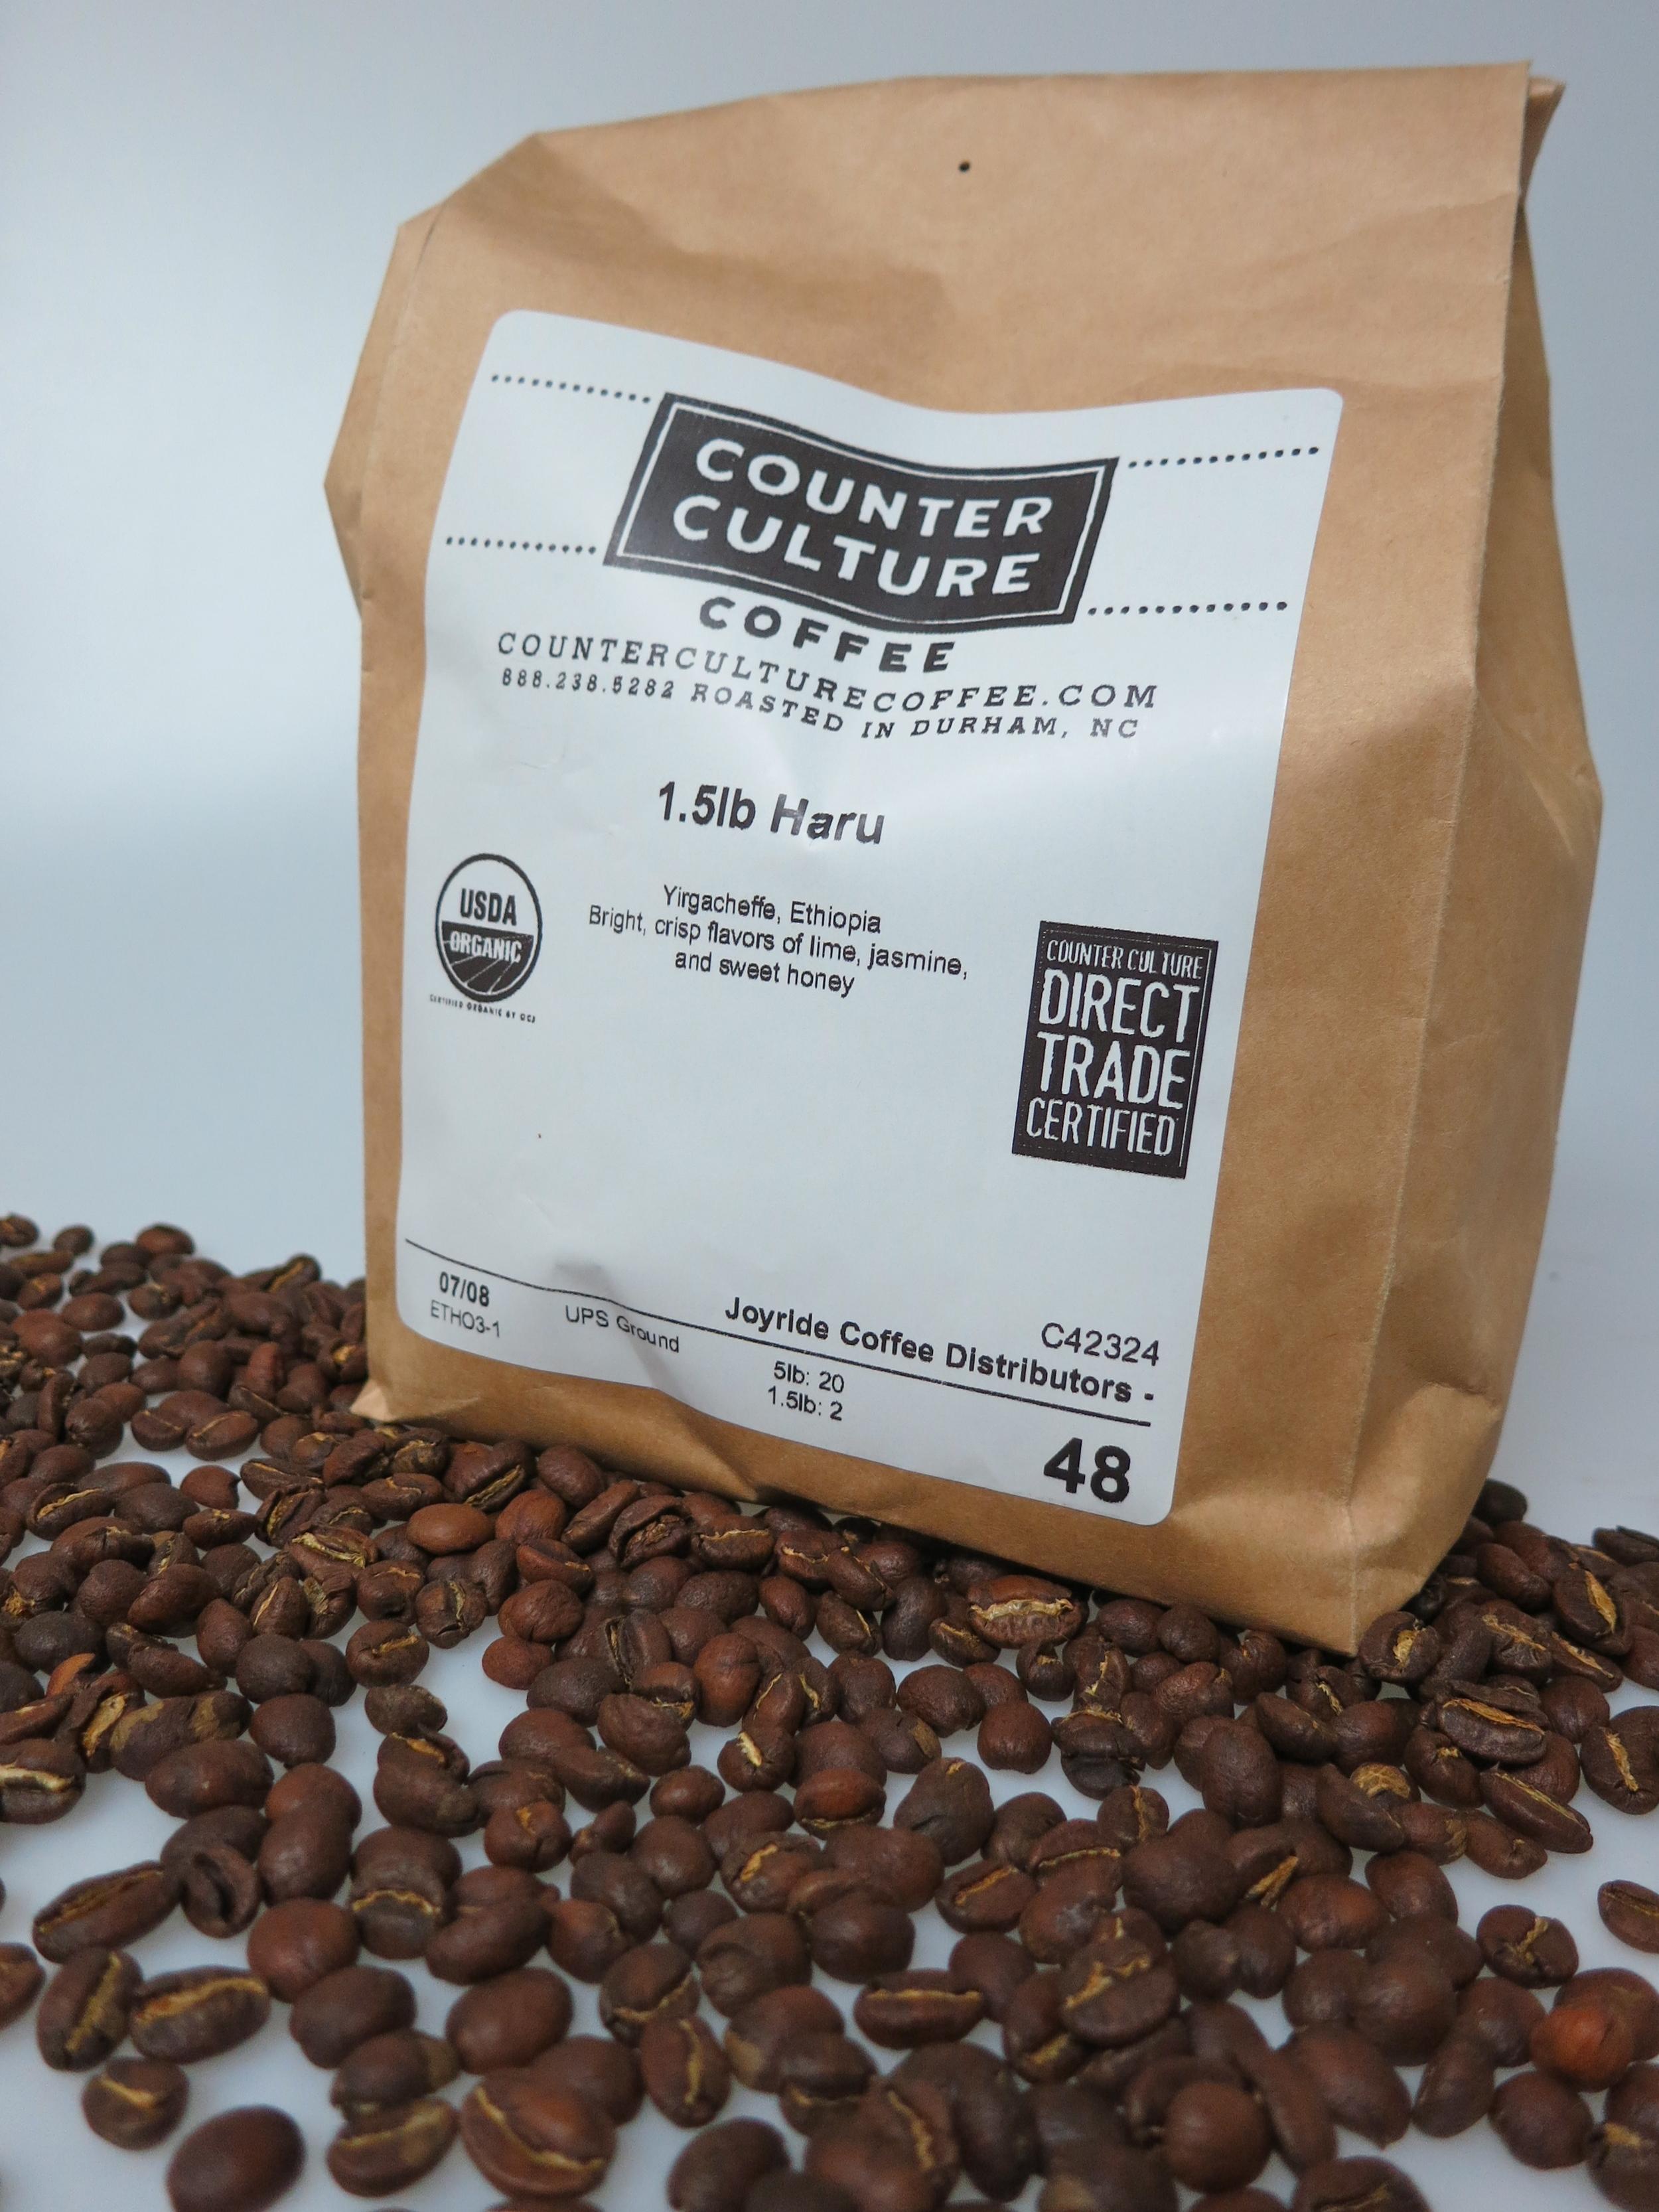 Joyride Coffee, Counter Culture Yirgacheffe